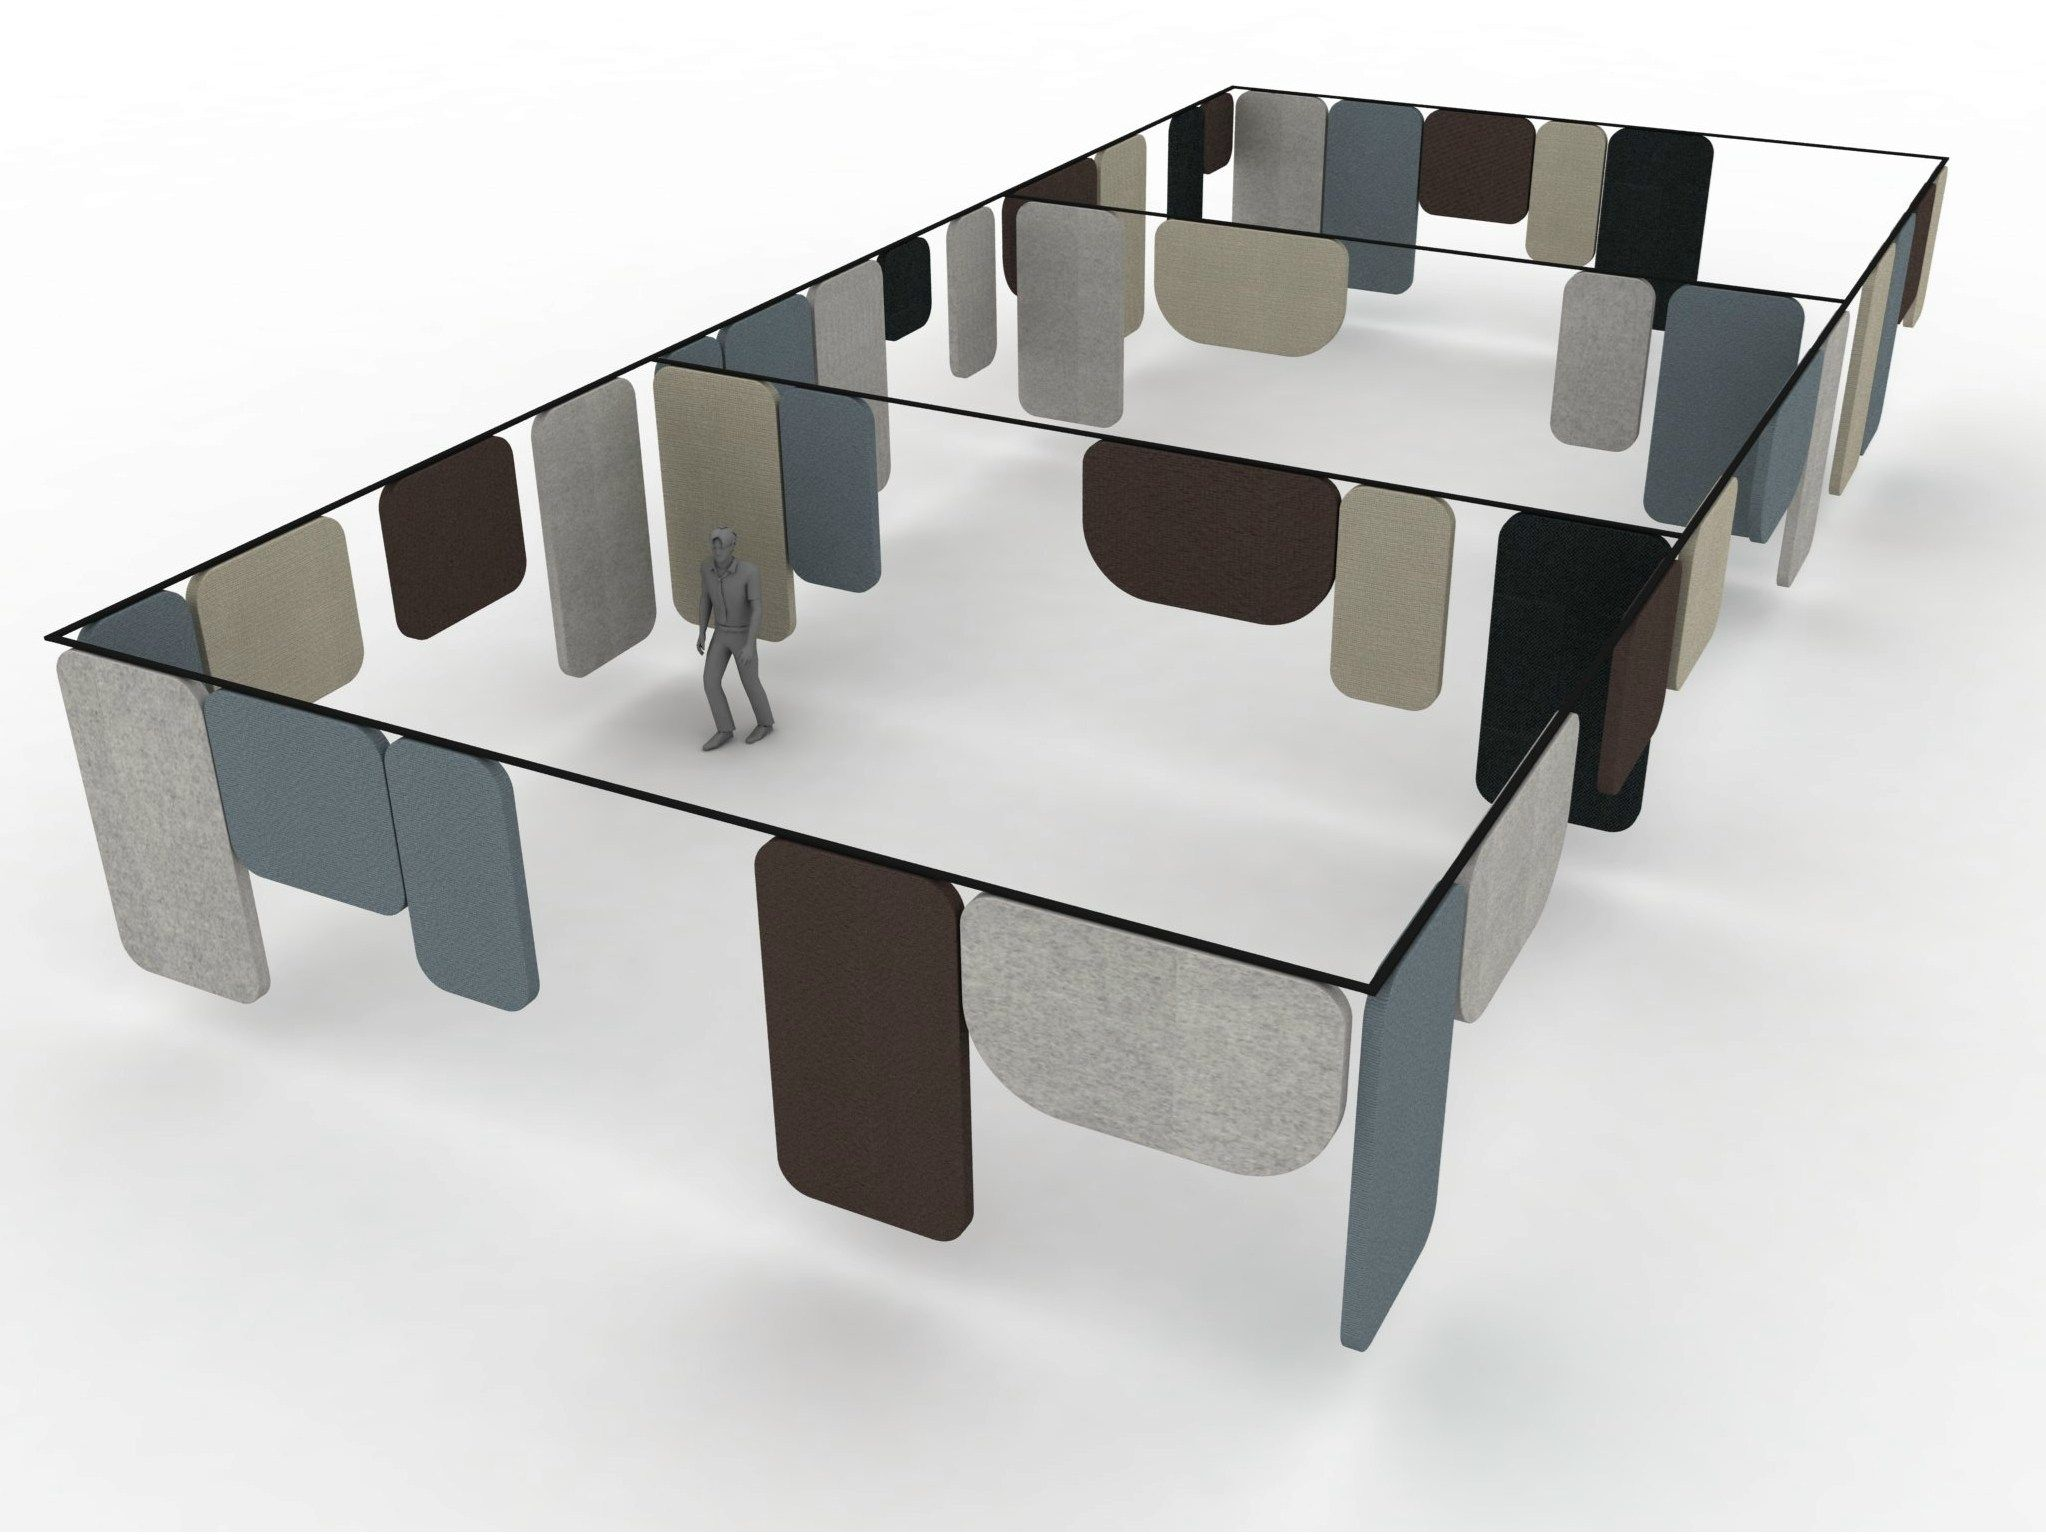 Panel de separaciÓn de escritorios fonoabsorbente notes colecciÓn